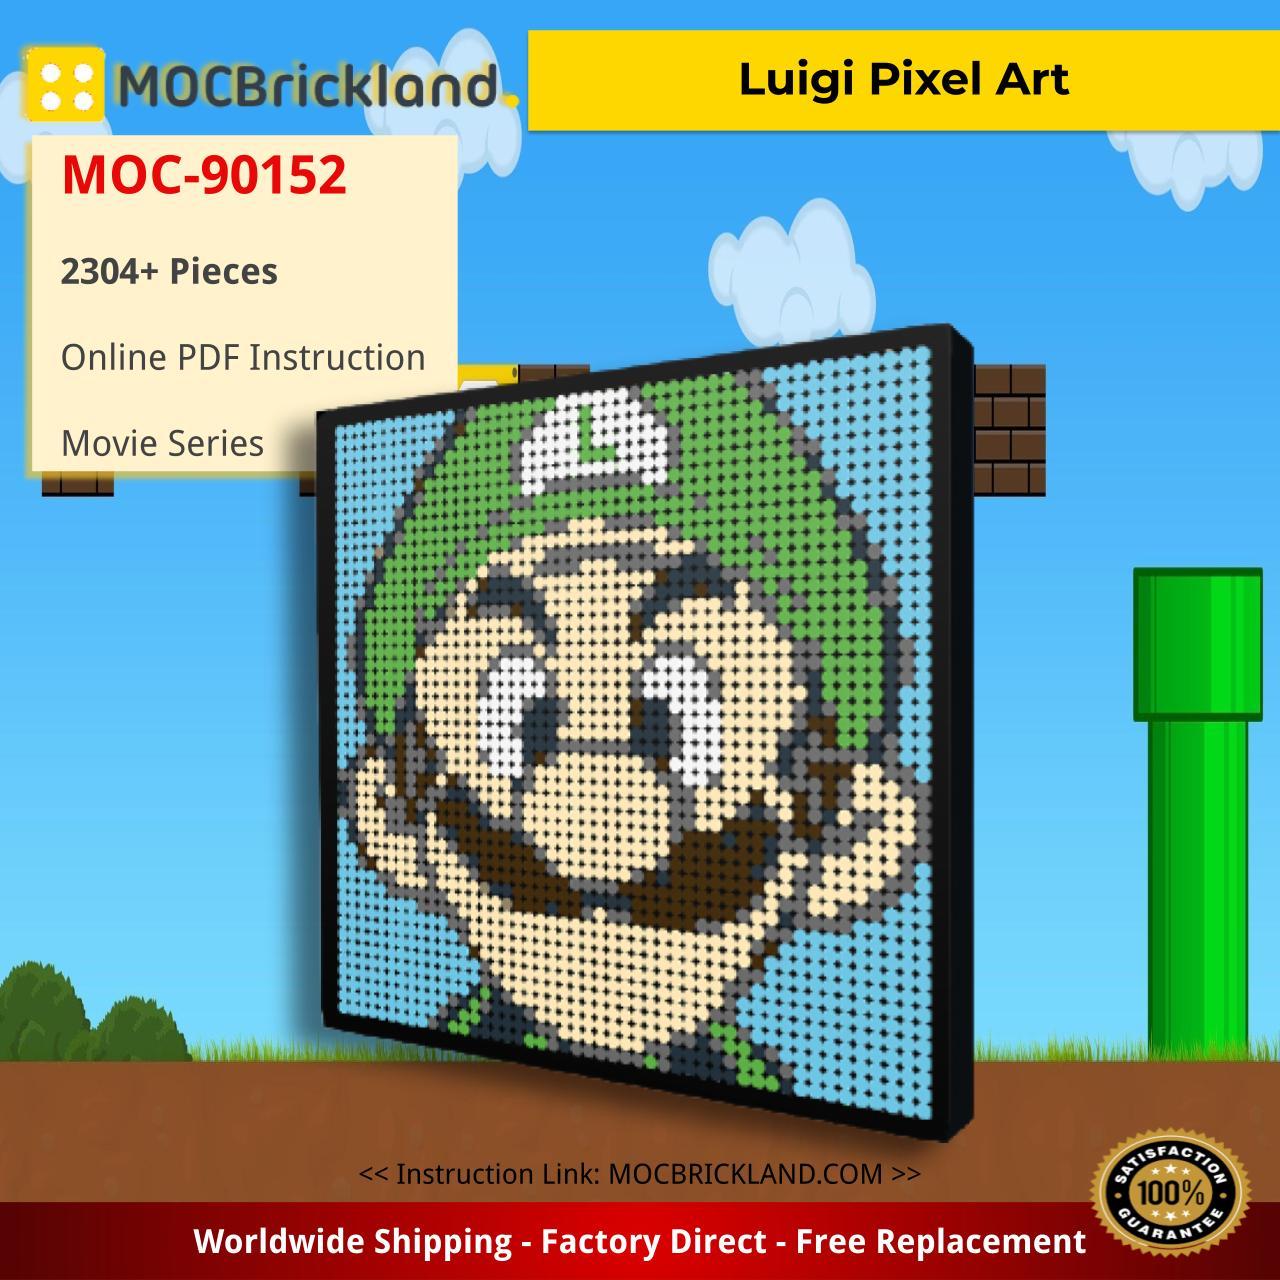 Movie MOC-90152 Luigi Pixel Art MOCBRICKLAND